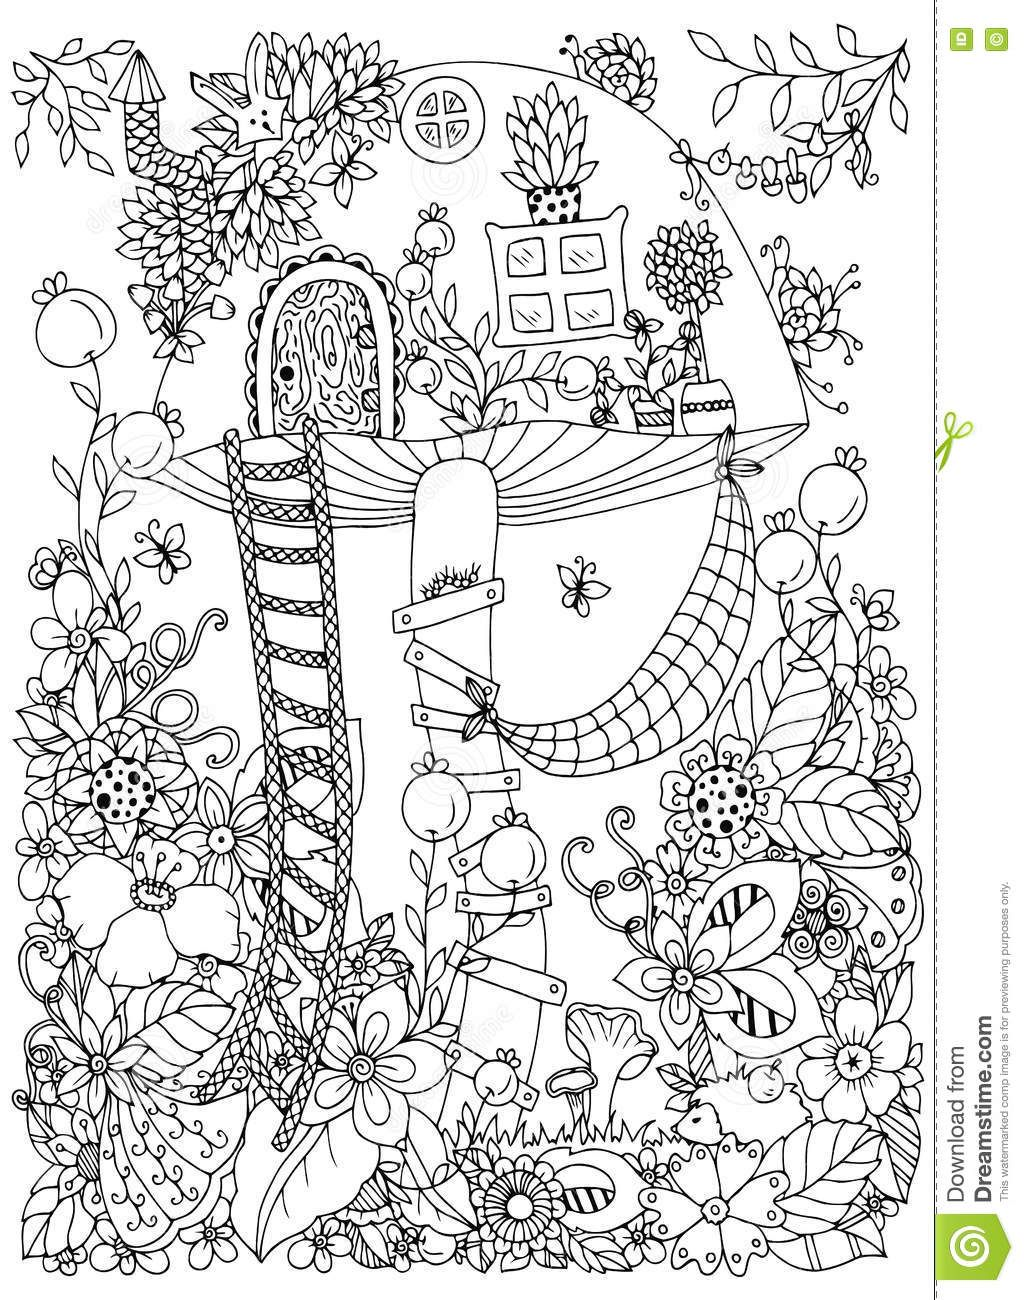 Pin von Patricia Iannone auf Diseños - Casas de duendes | Pinterest ...